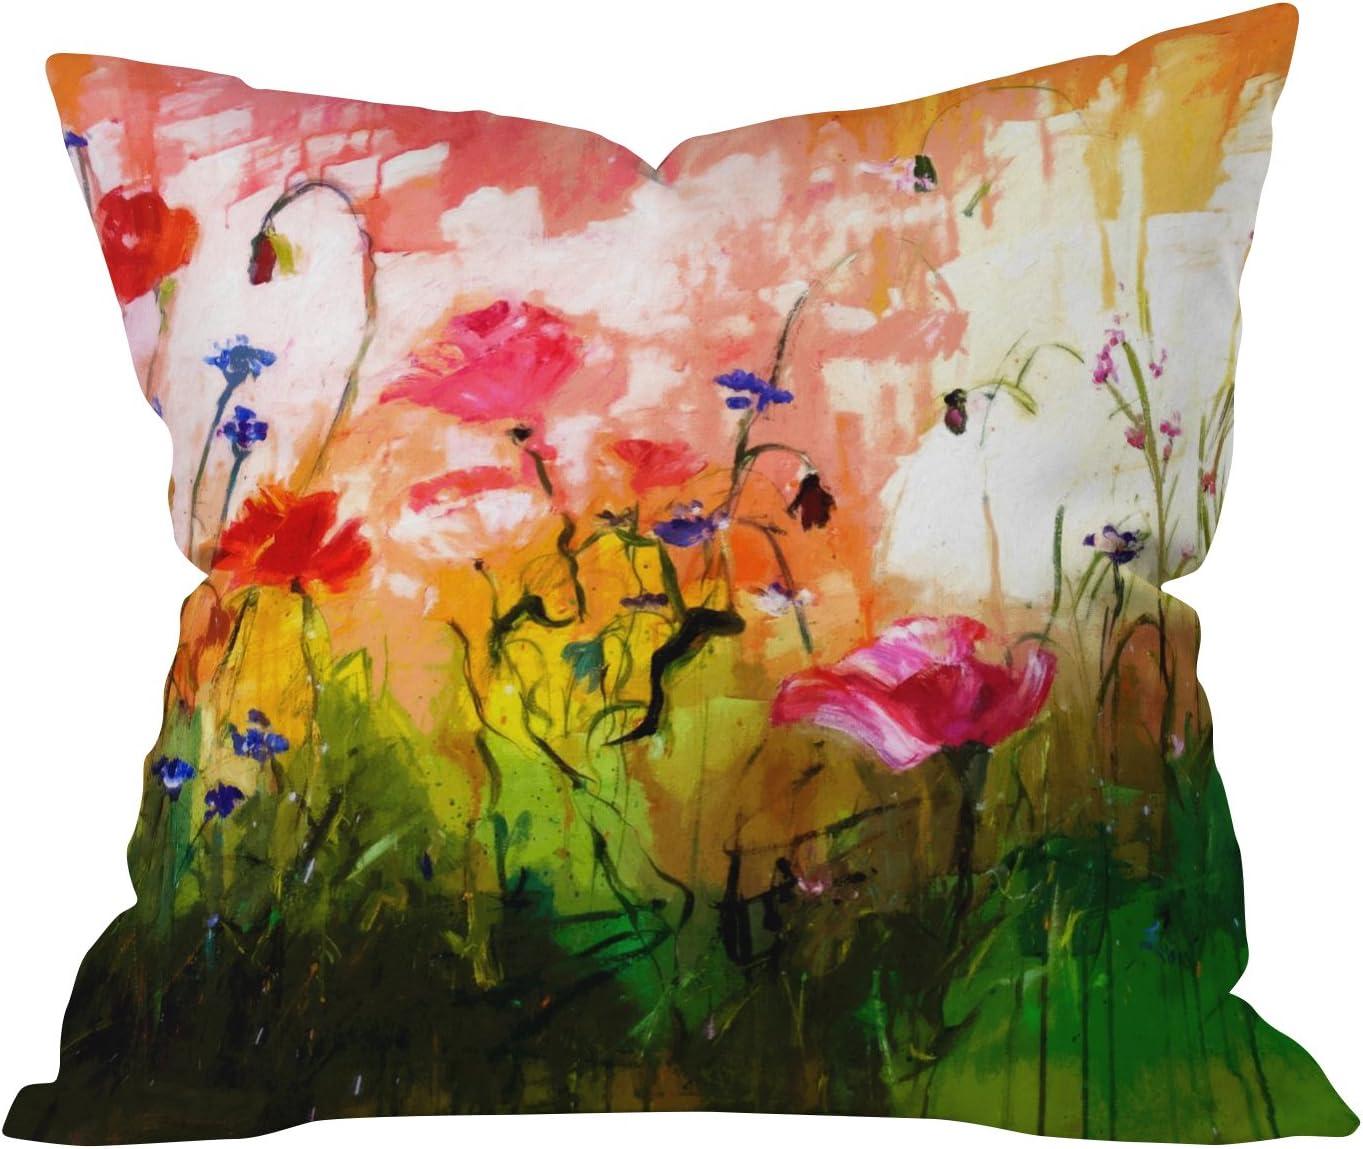 Deny Designs Ginette Fine Art Jardin Rose Throw Pillow, 26 x 26